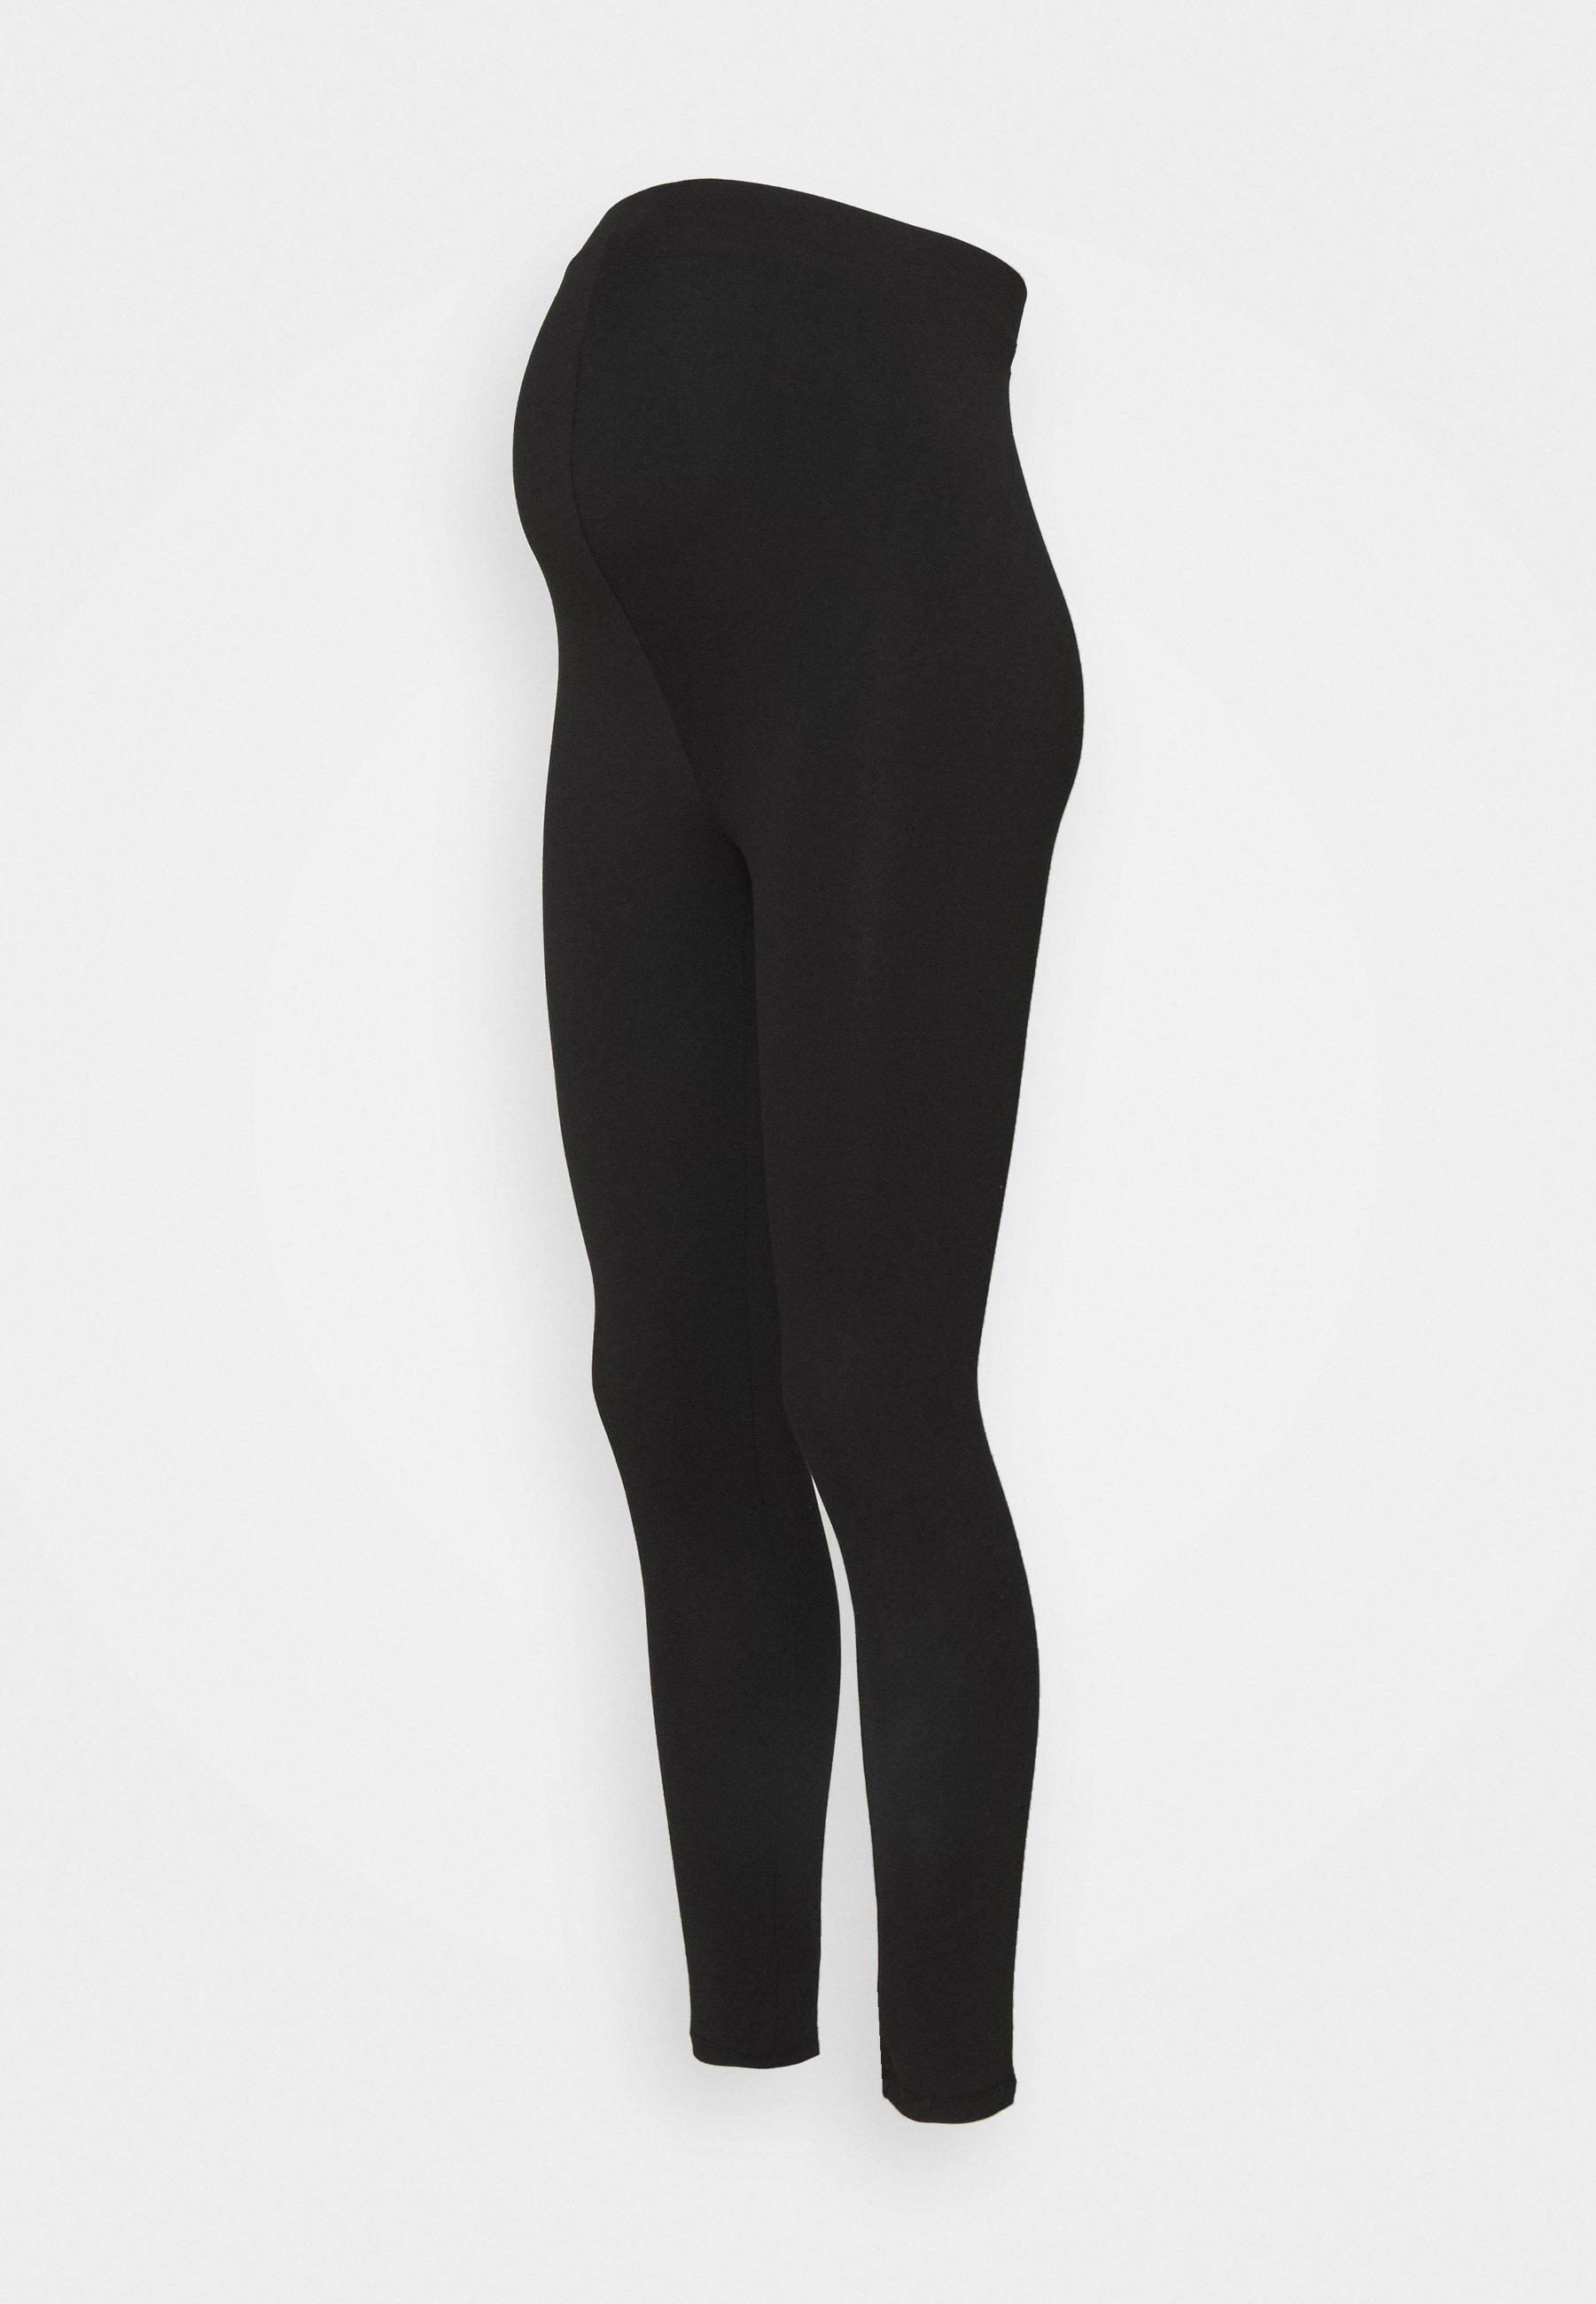 Femme WITH WAISTBAND - Legging